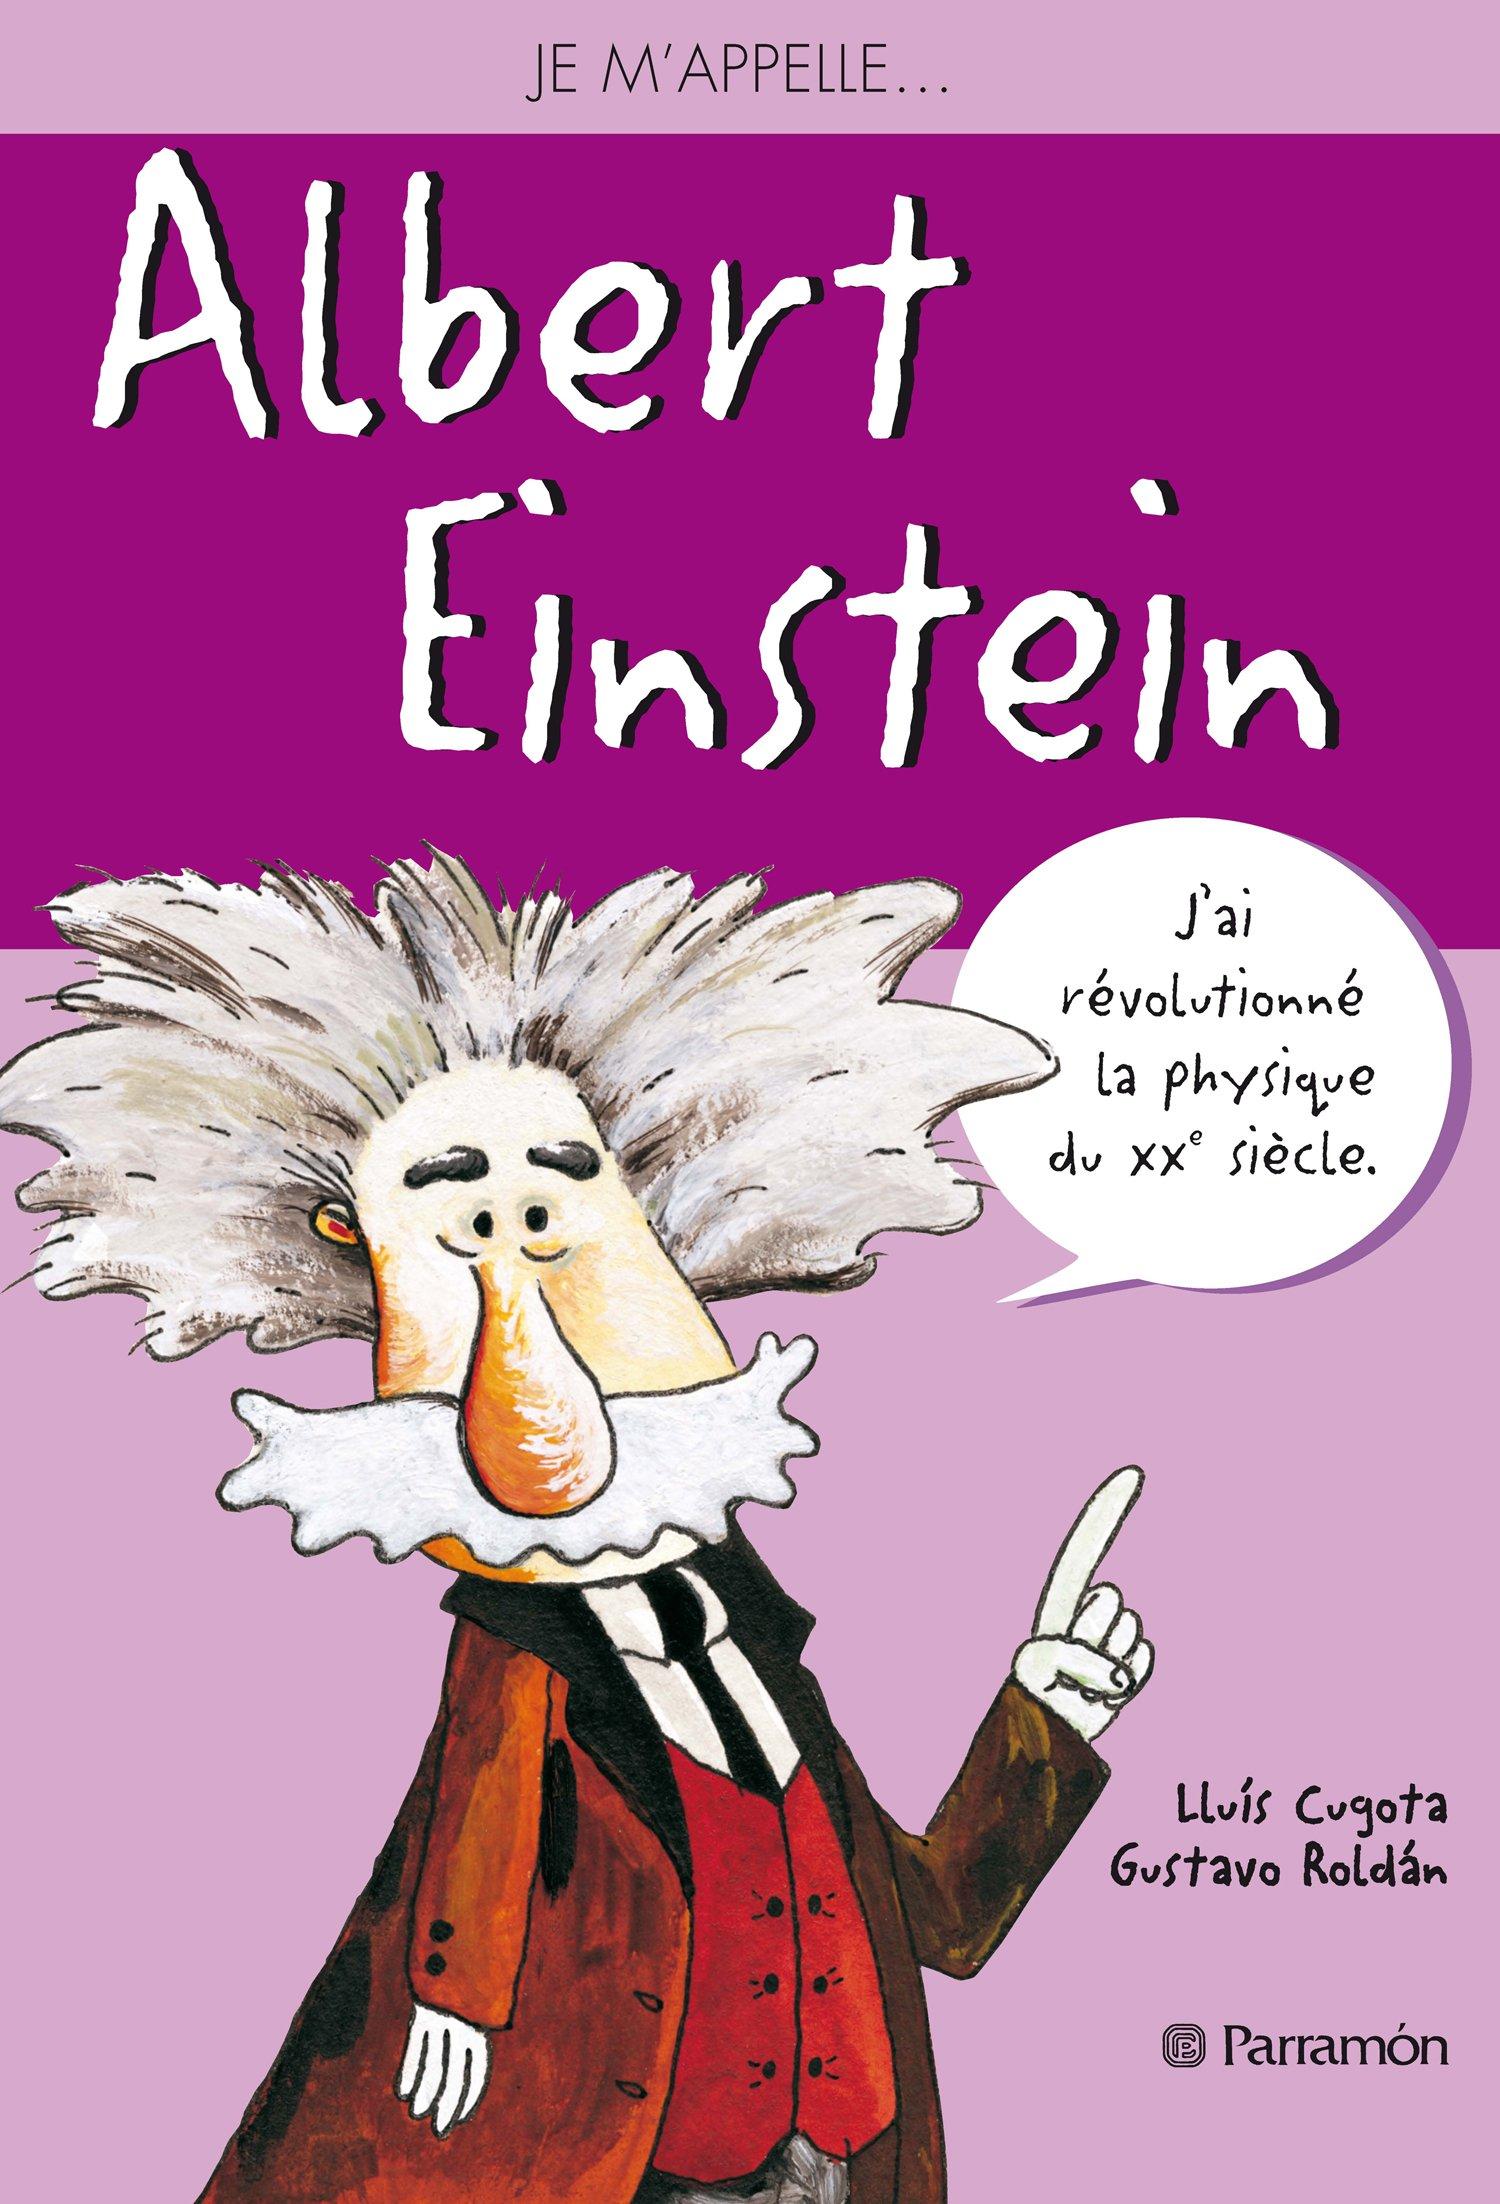 Je m'appelle Albert Einstein Broché – 2 juin 2014 Lluis Cugota Gustavo Roldan Paola Appelius-Roy Parramon France